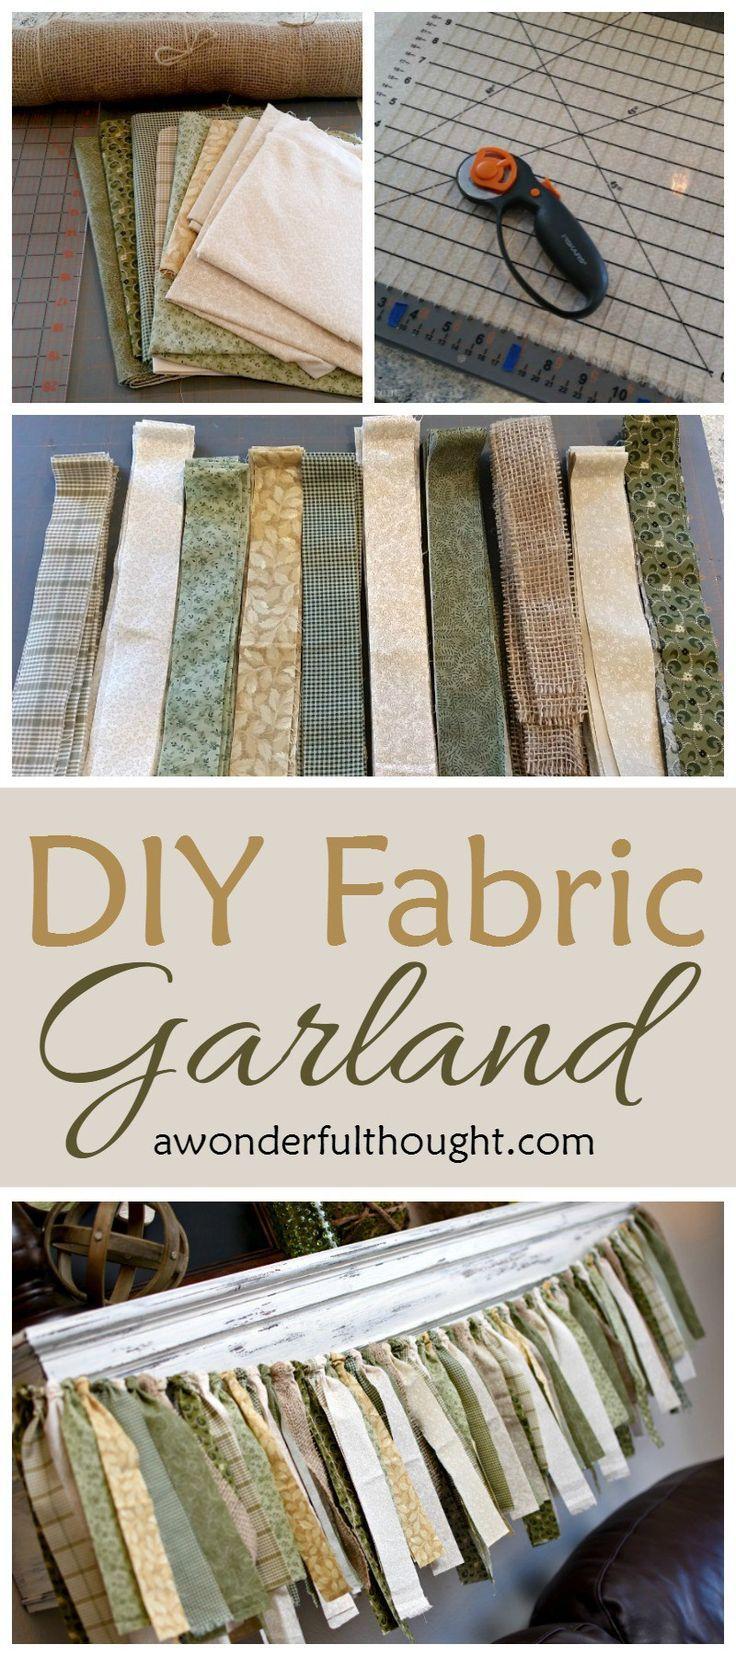 DIY Fabric Garland awonderfulthoughtcom DIY Fabric